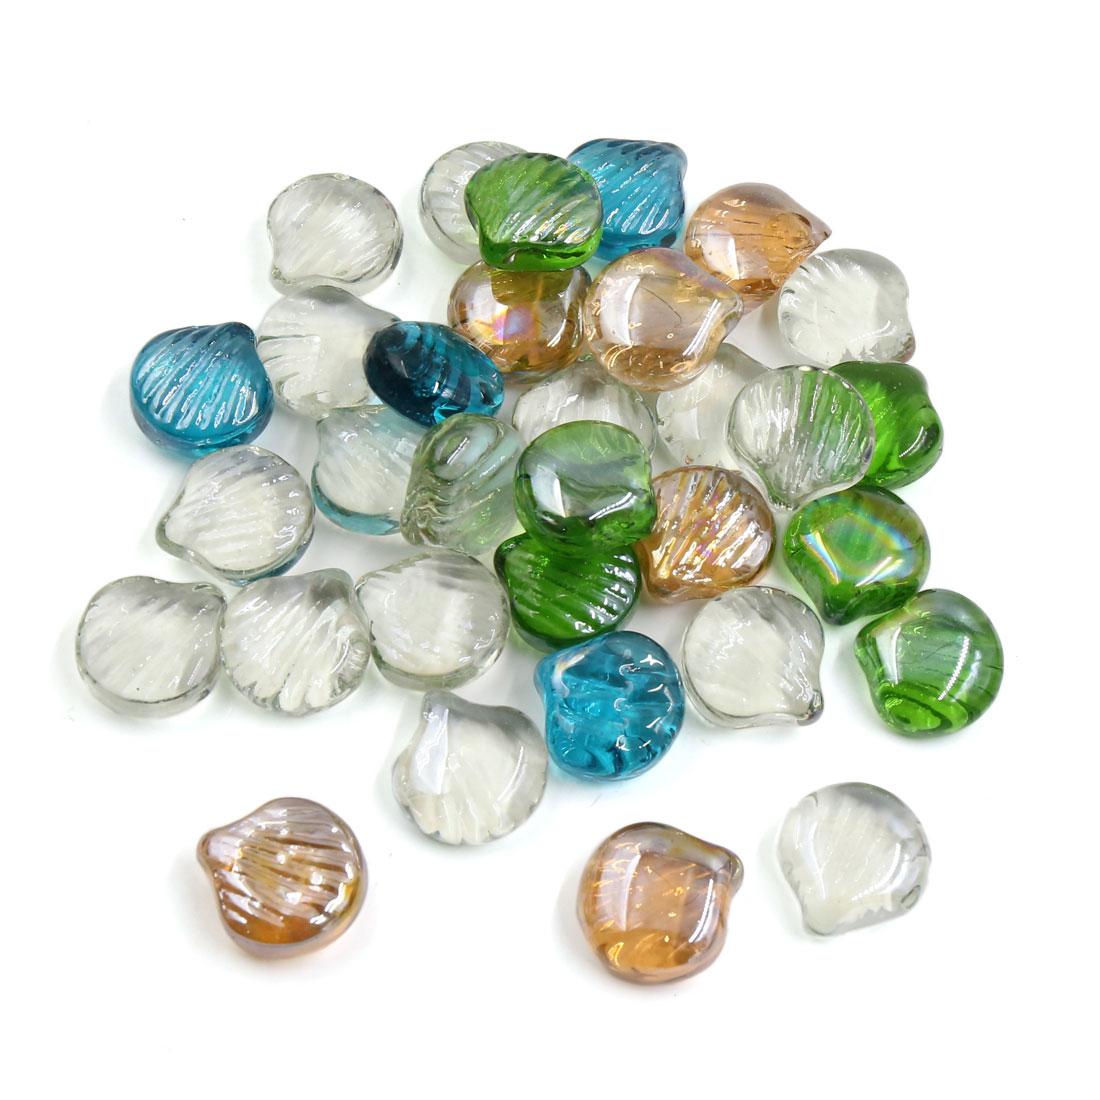 500g Multicolor Glass Scallop Shaped Fish Tank Aquarium Decor Pebble Bead Stones